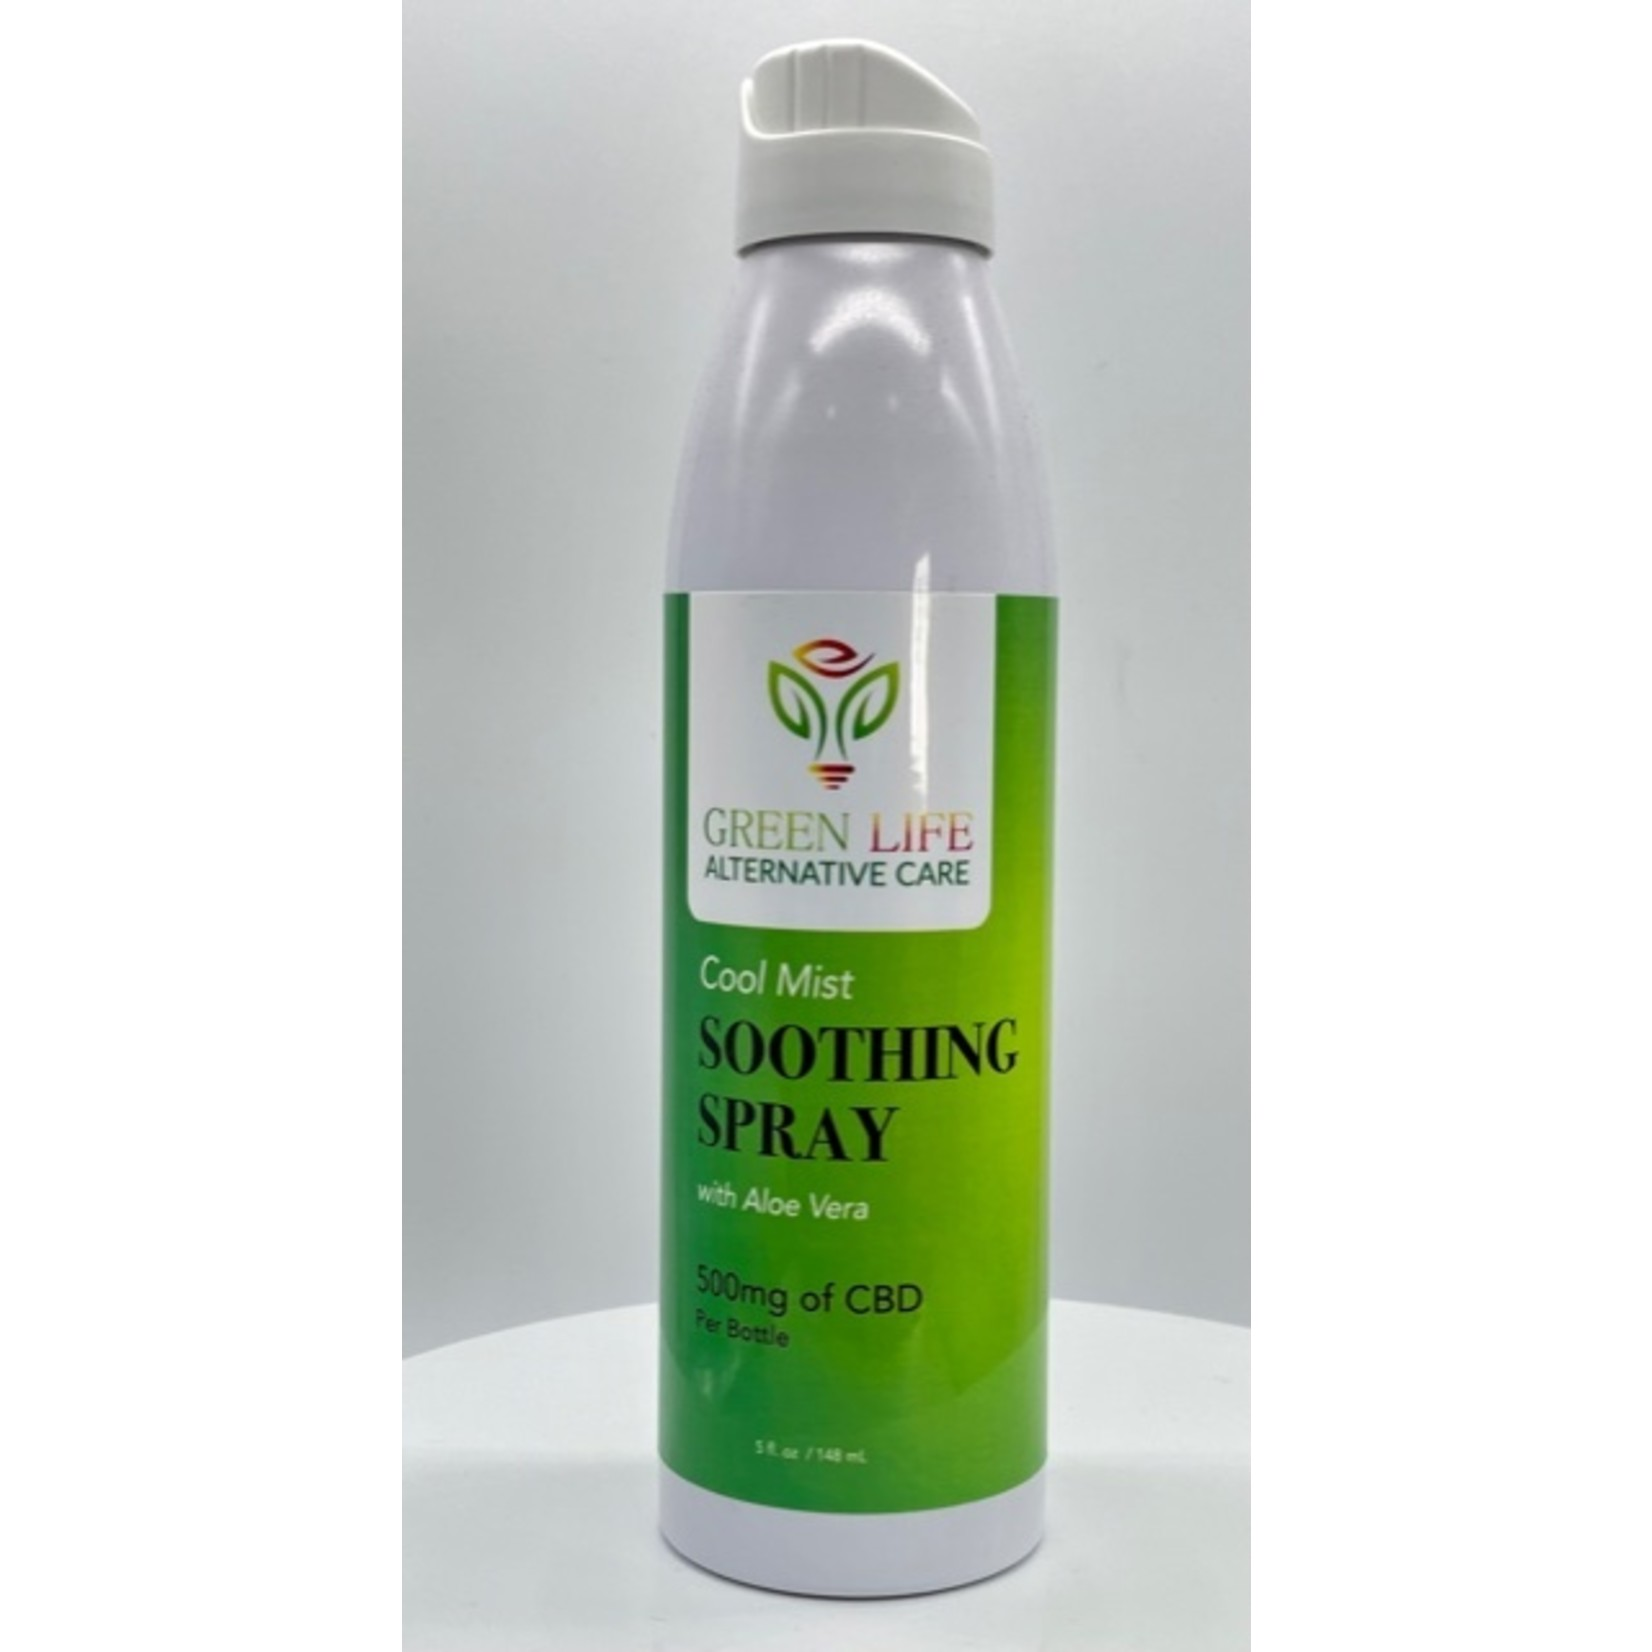 GLAC Green Life CBD Cool Mist Soothing Spray Aloe Vera 500mg